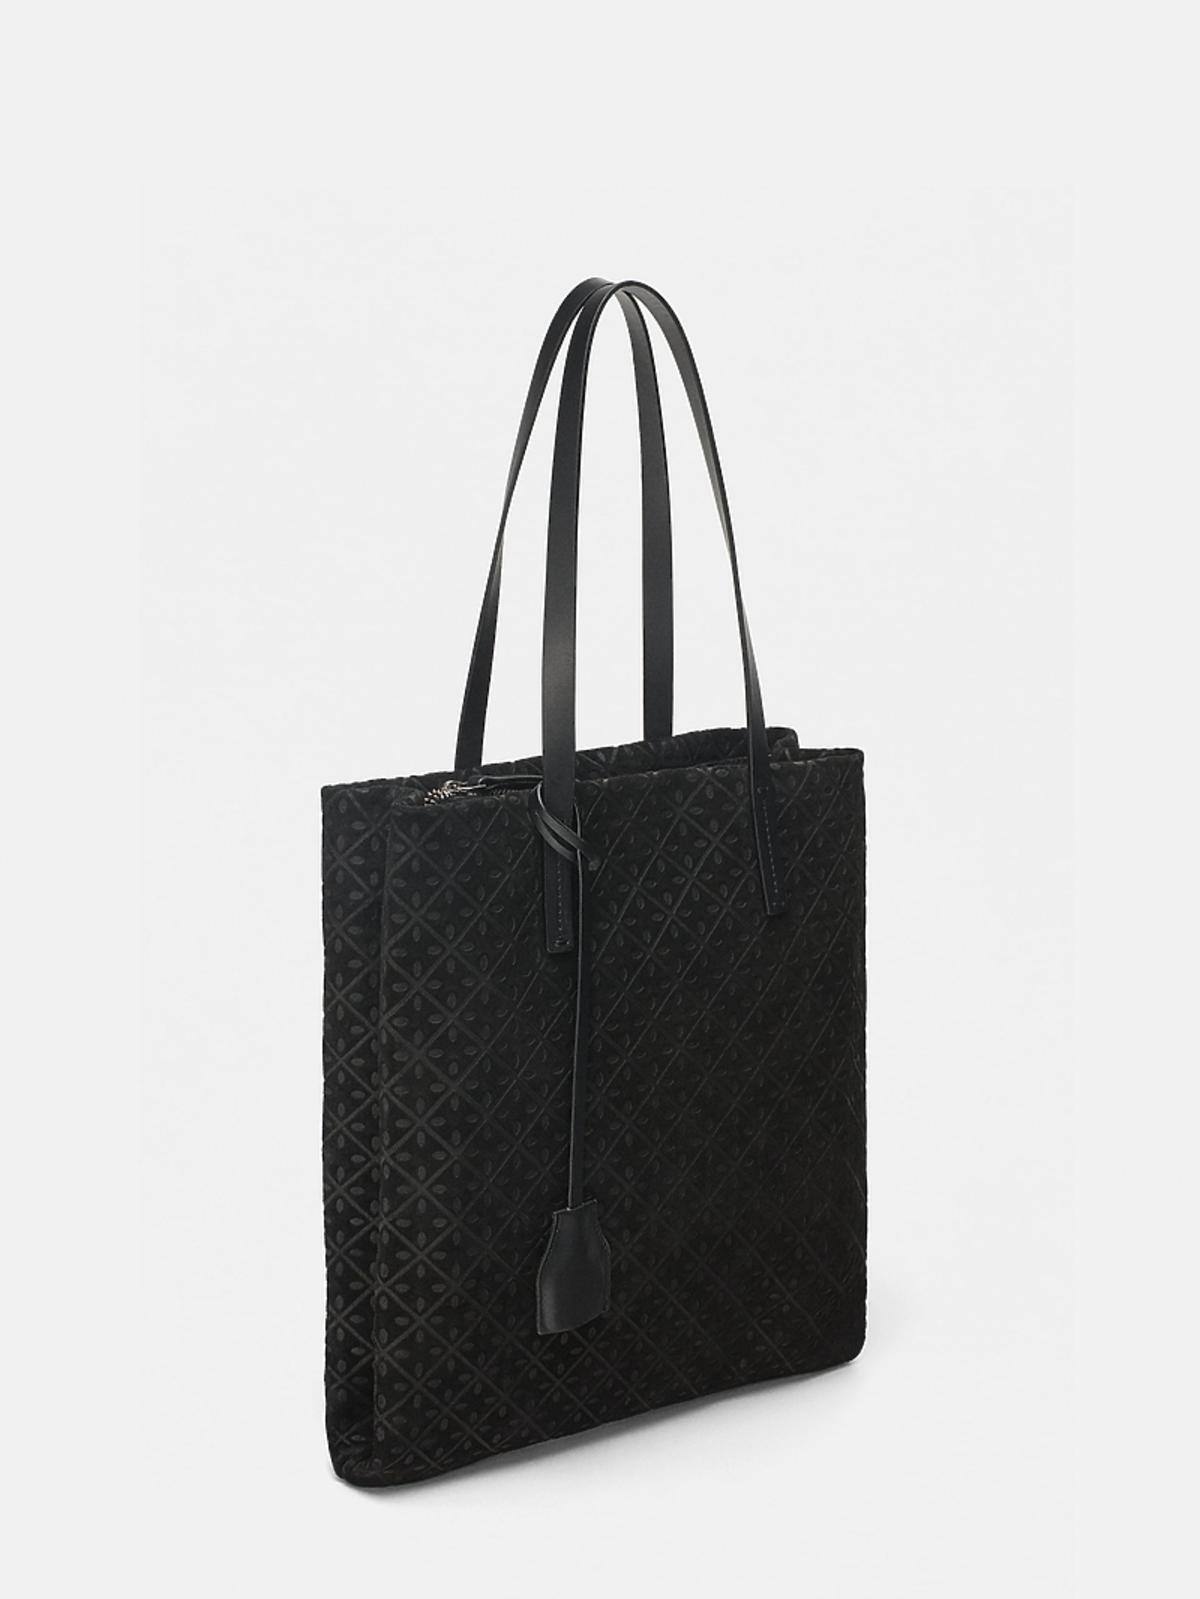 Zara, 299 zł